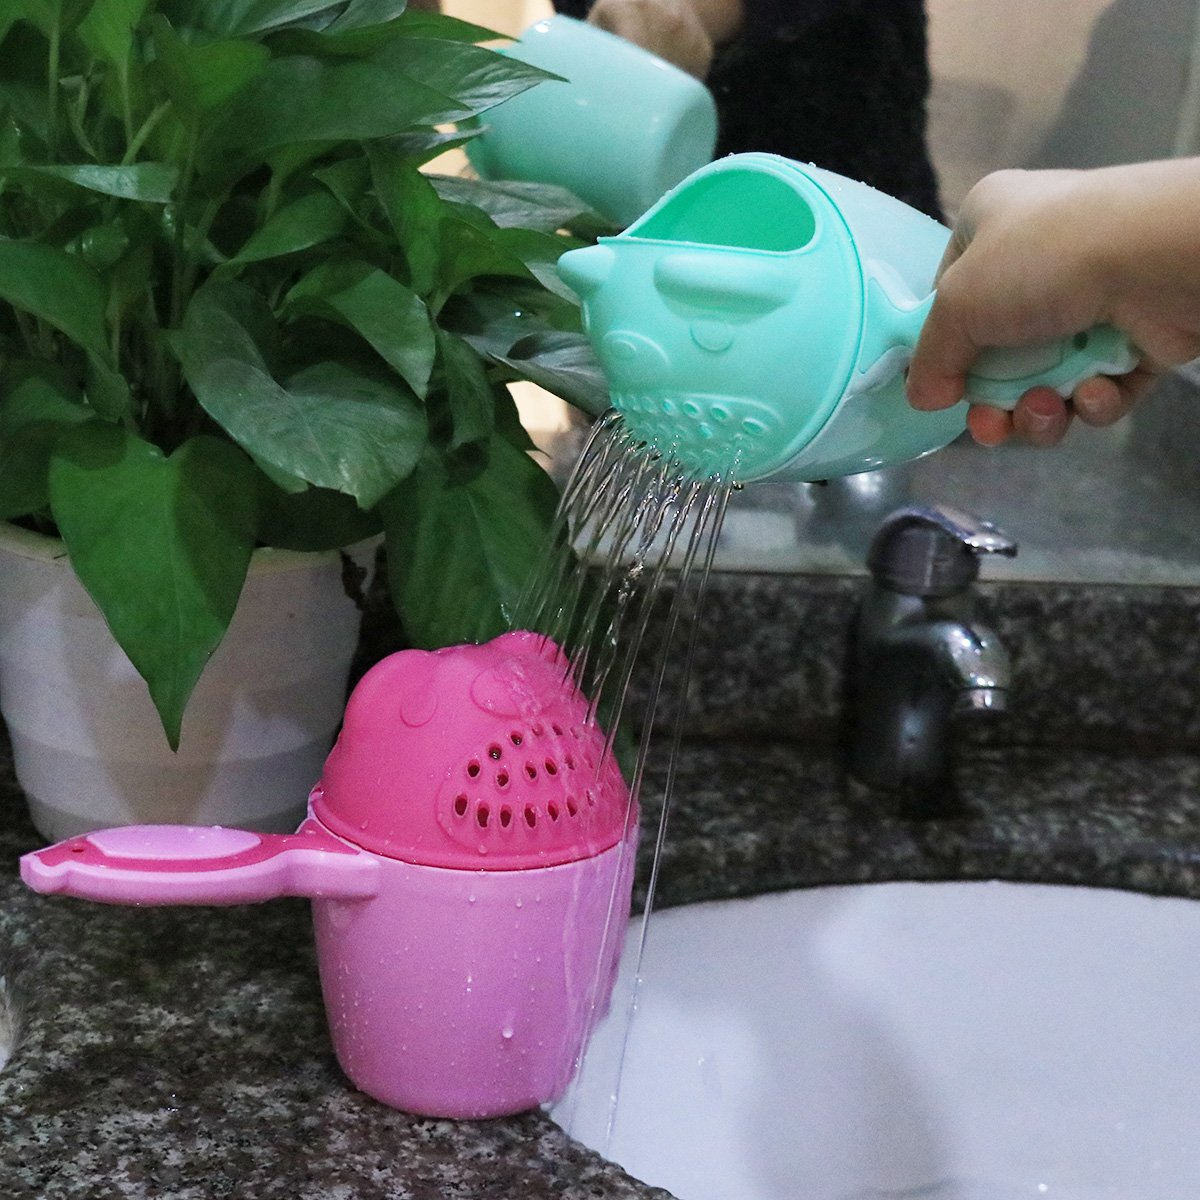 CHICTRY Baby Shower Rinse Cup Cute Cartoon Bear Shaped Kids Bath Bailer Shampoo Rinser Wash Hair Eye Shield Shampoo Bath Spoon Light Green One Size